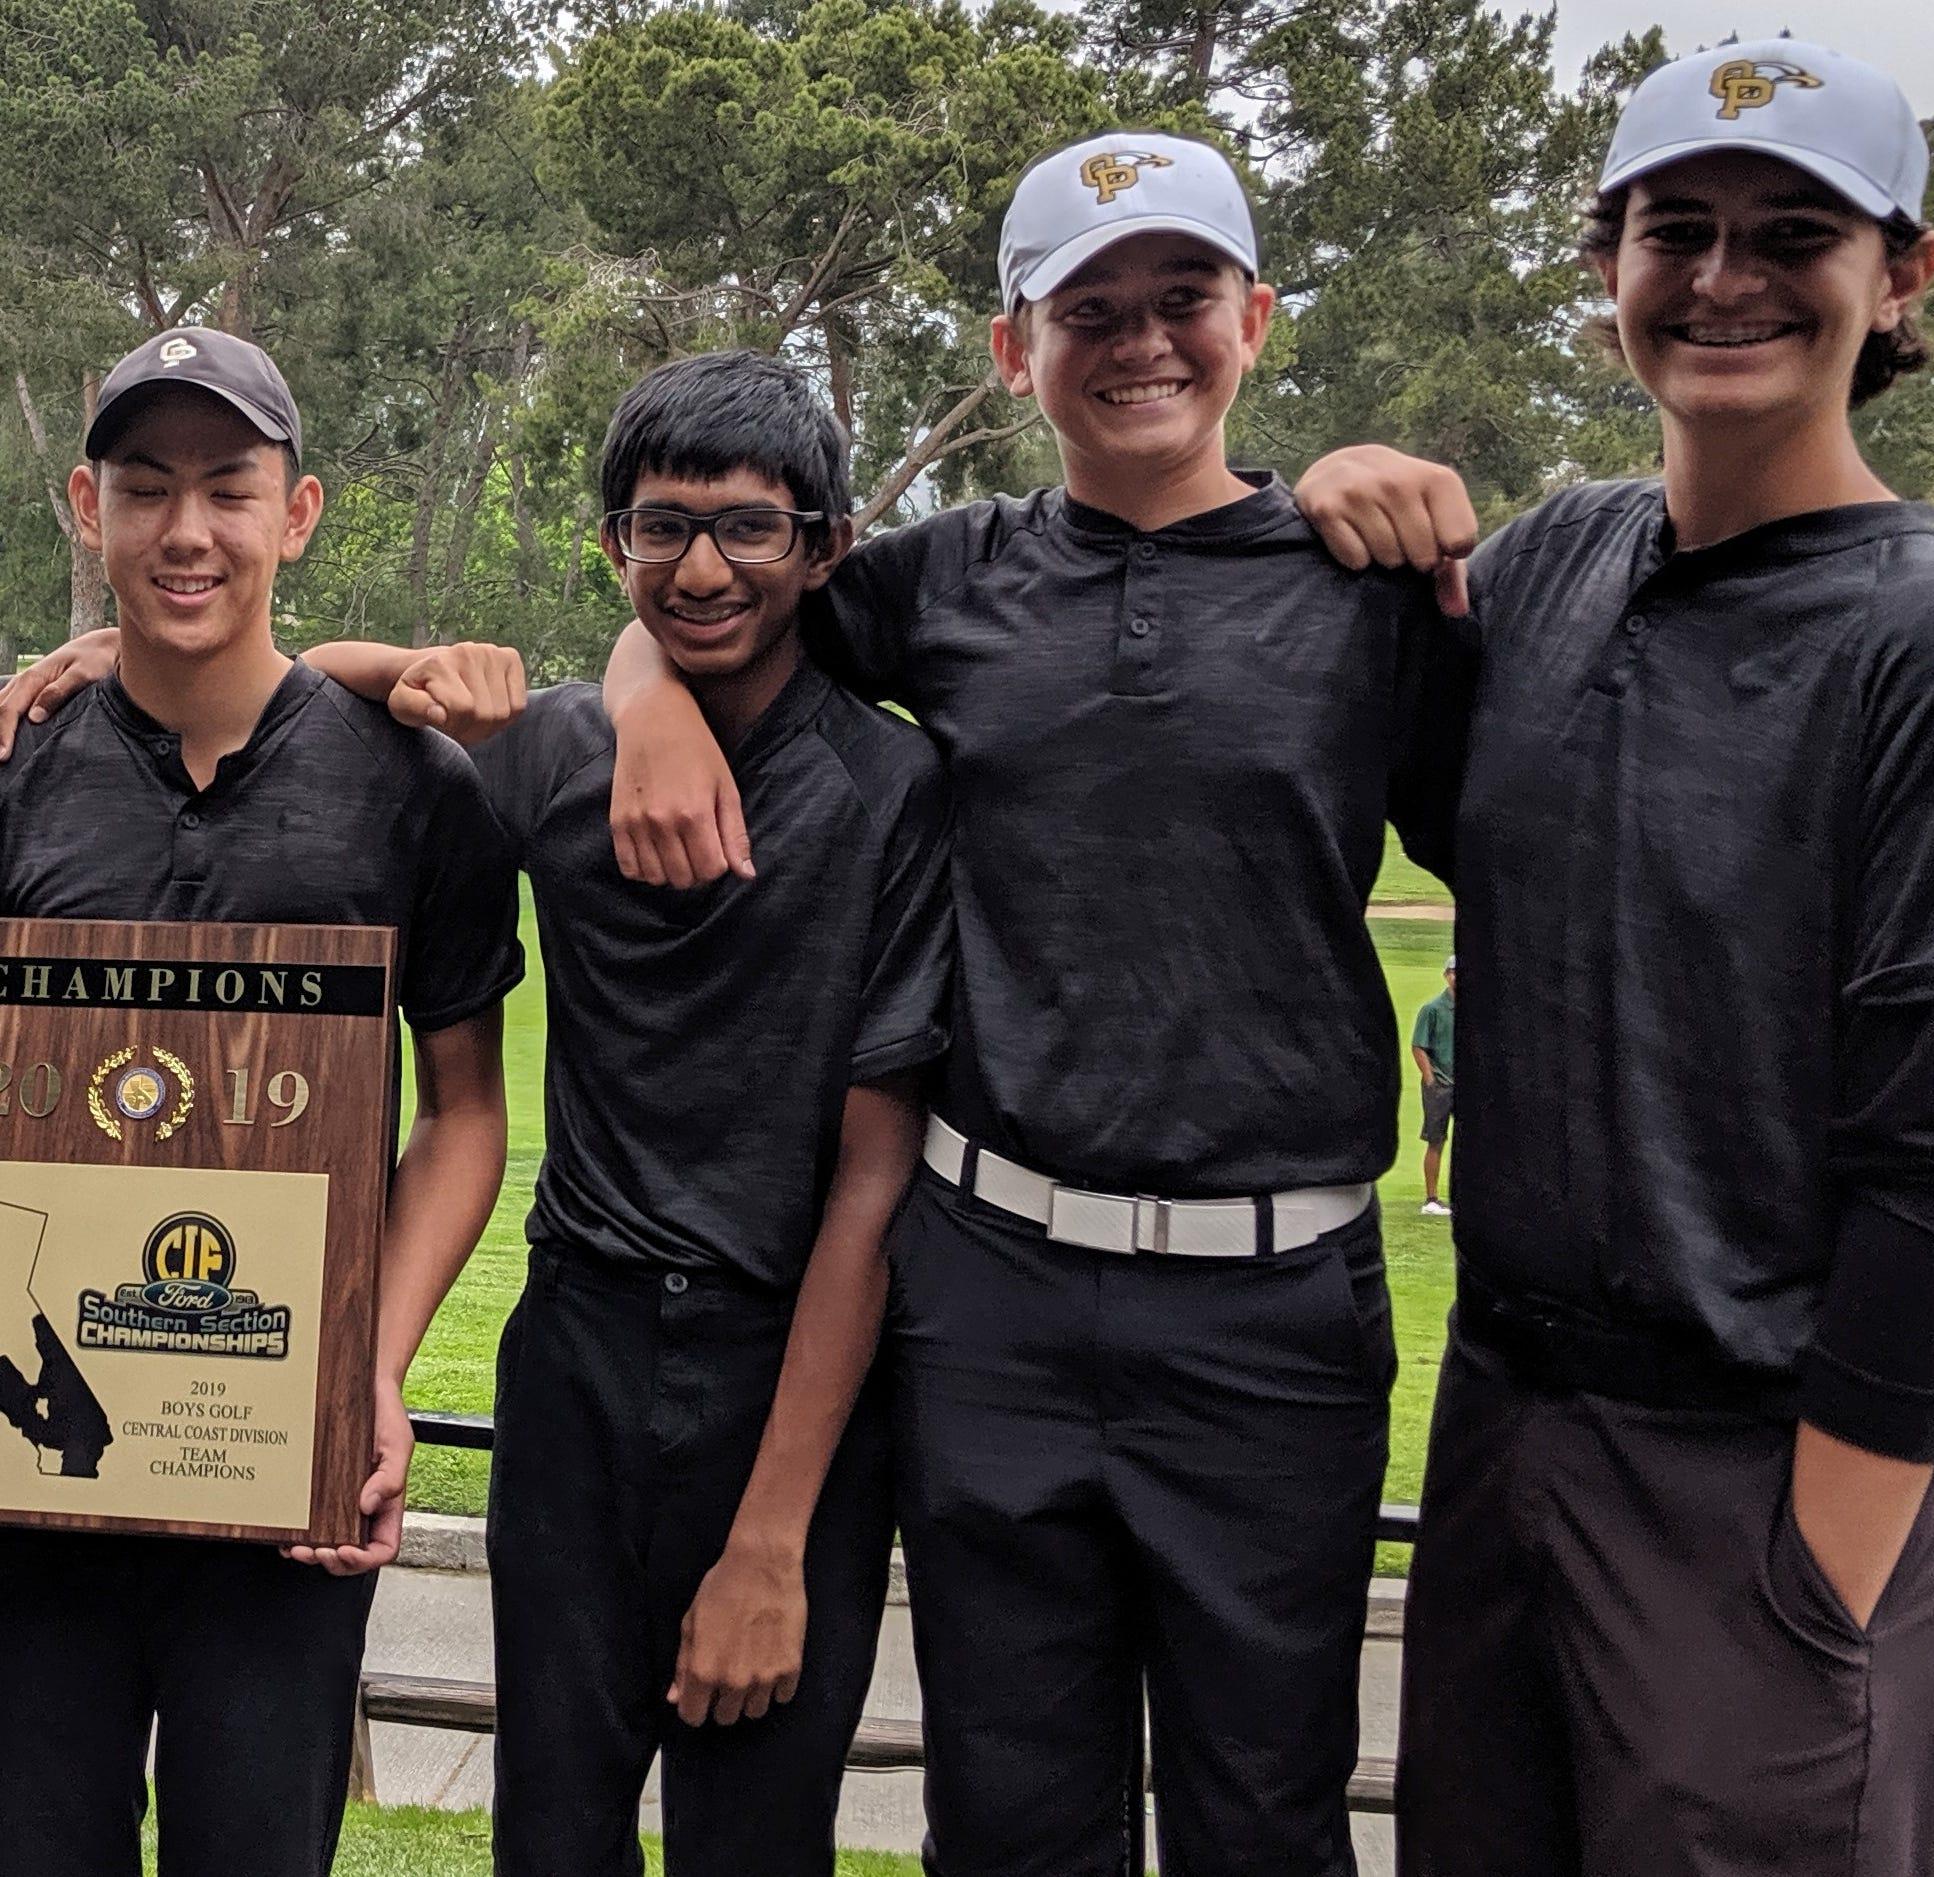 Oak Park boys golf team wins CIF Central Coast championship